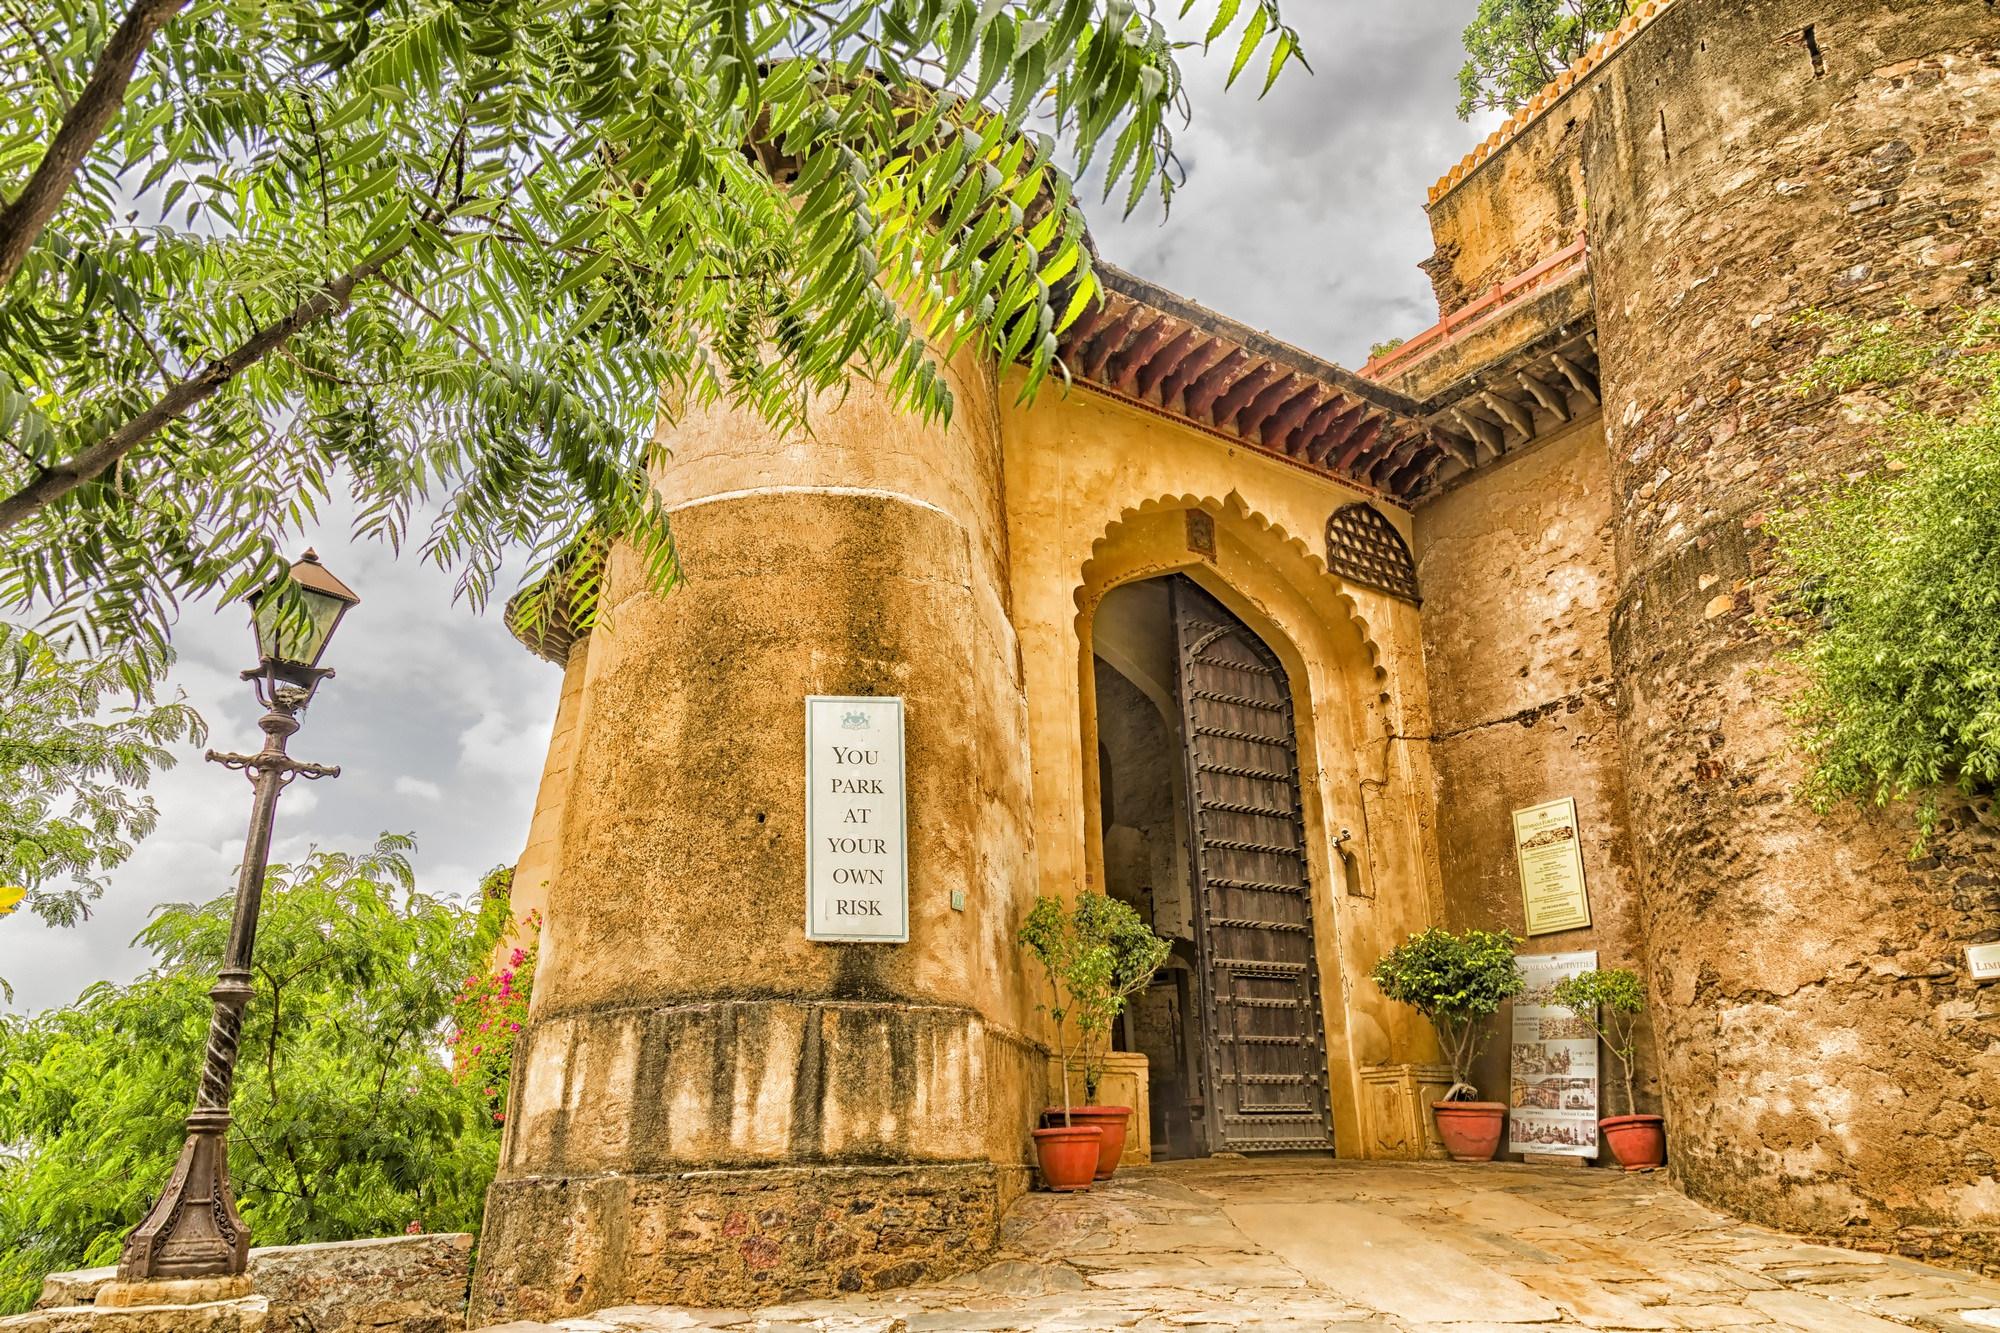 Main Gate of Neemrana Fort, Rajasthan